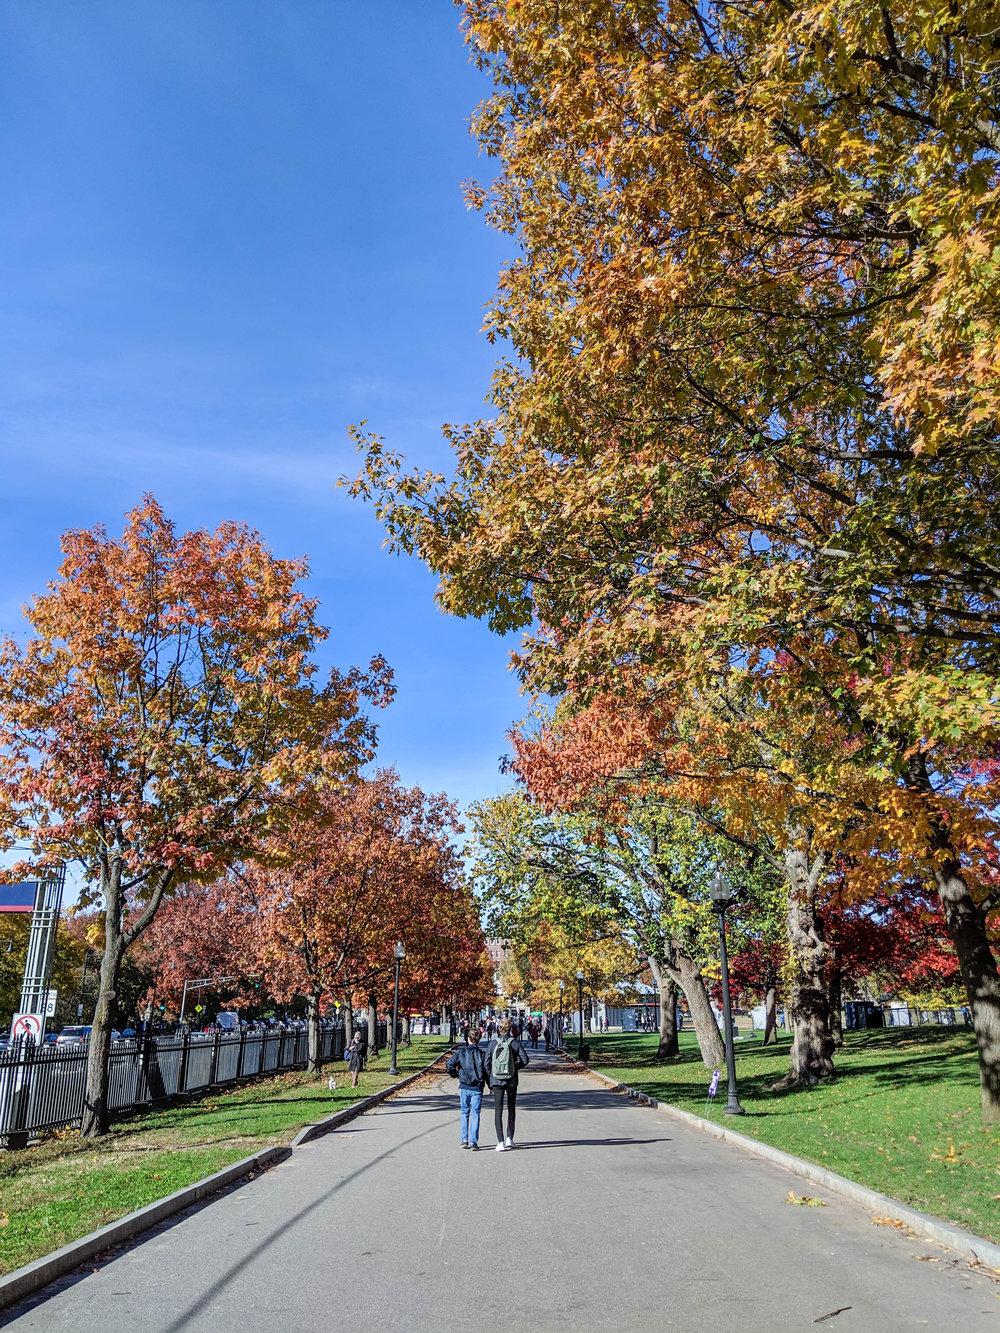 bri rinehart; photography; fall; boston; boston commons; nature